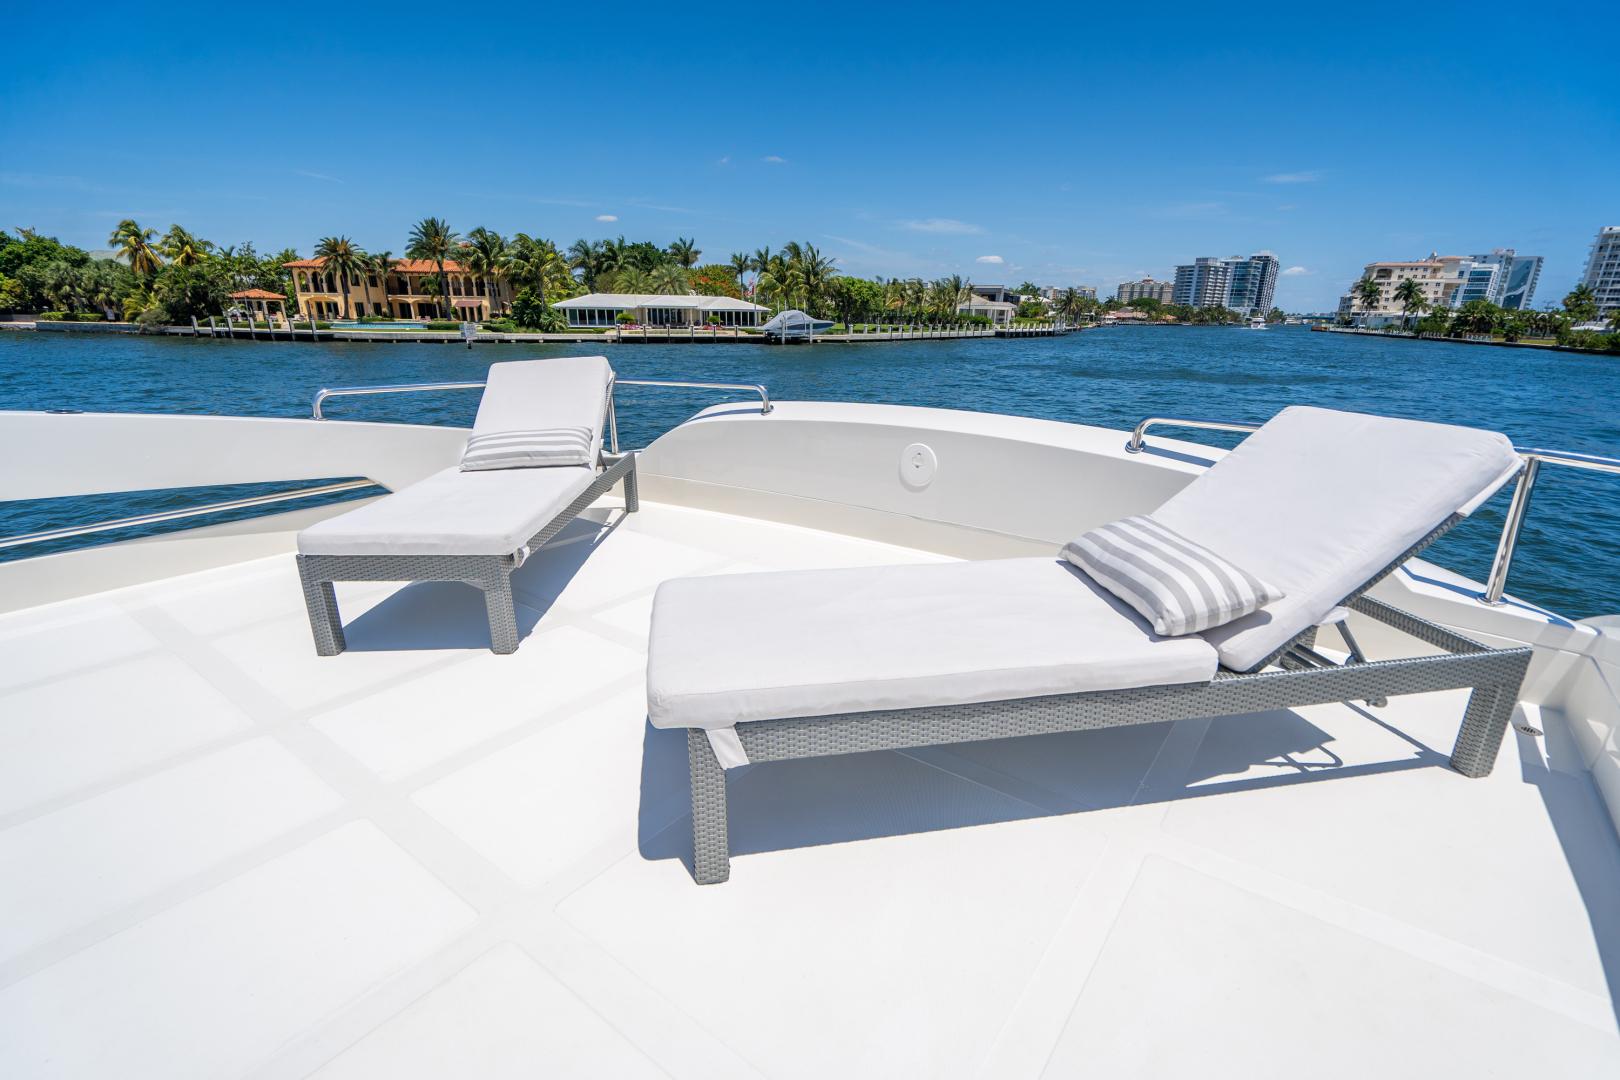 Overblue-58 Power Catamaran 2017-Techuila Ft. Lauderdale-Florida-United States-2017 Overblue 58 Powercat-1401208   Thumbnail